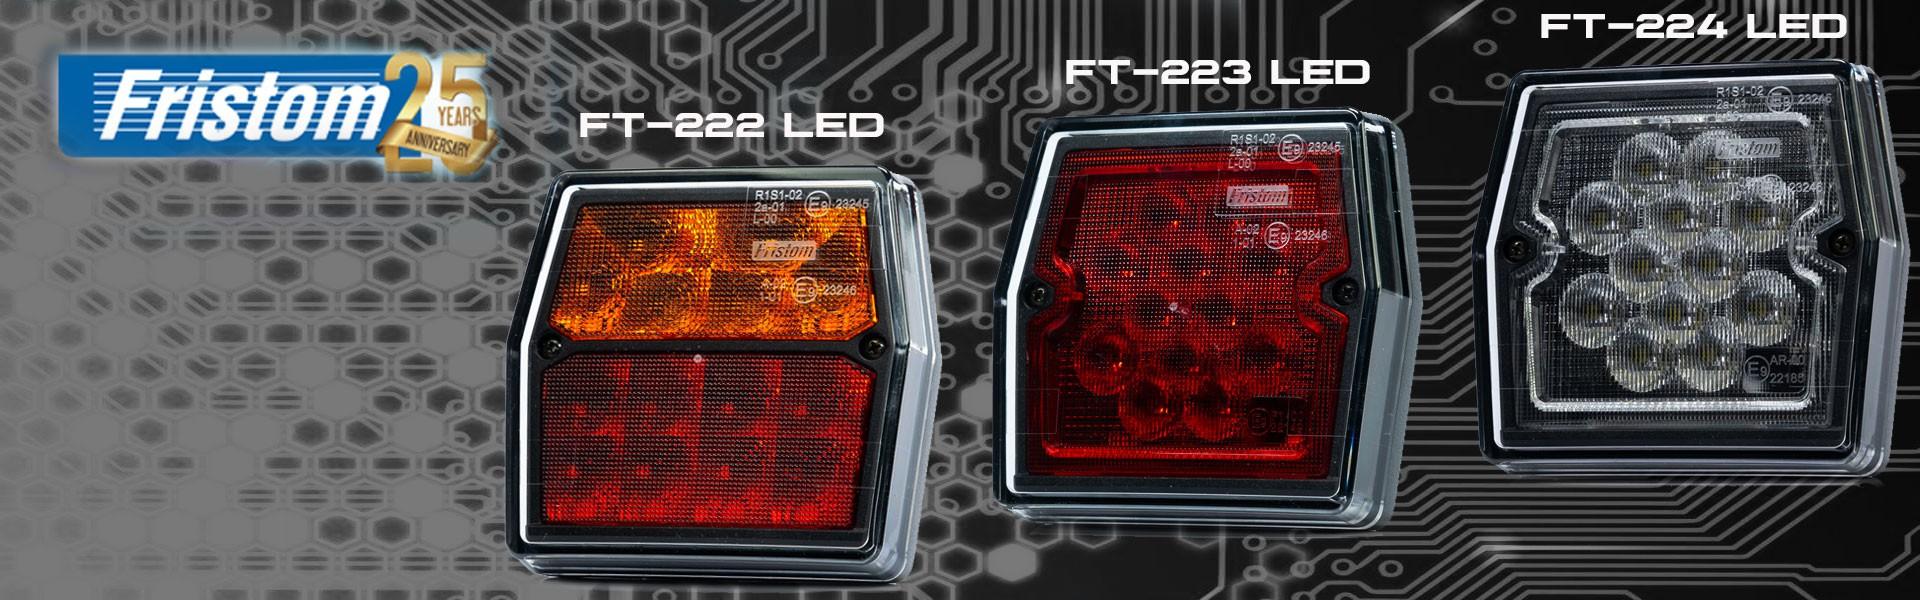 FRISTOM FT-222 LED